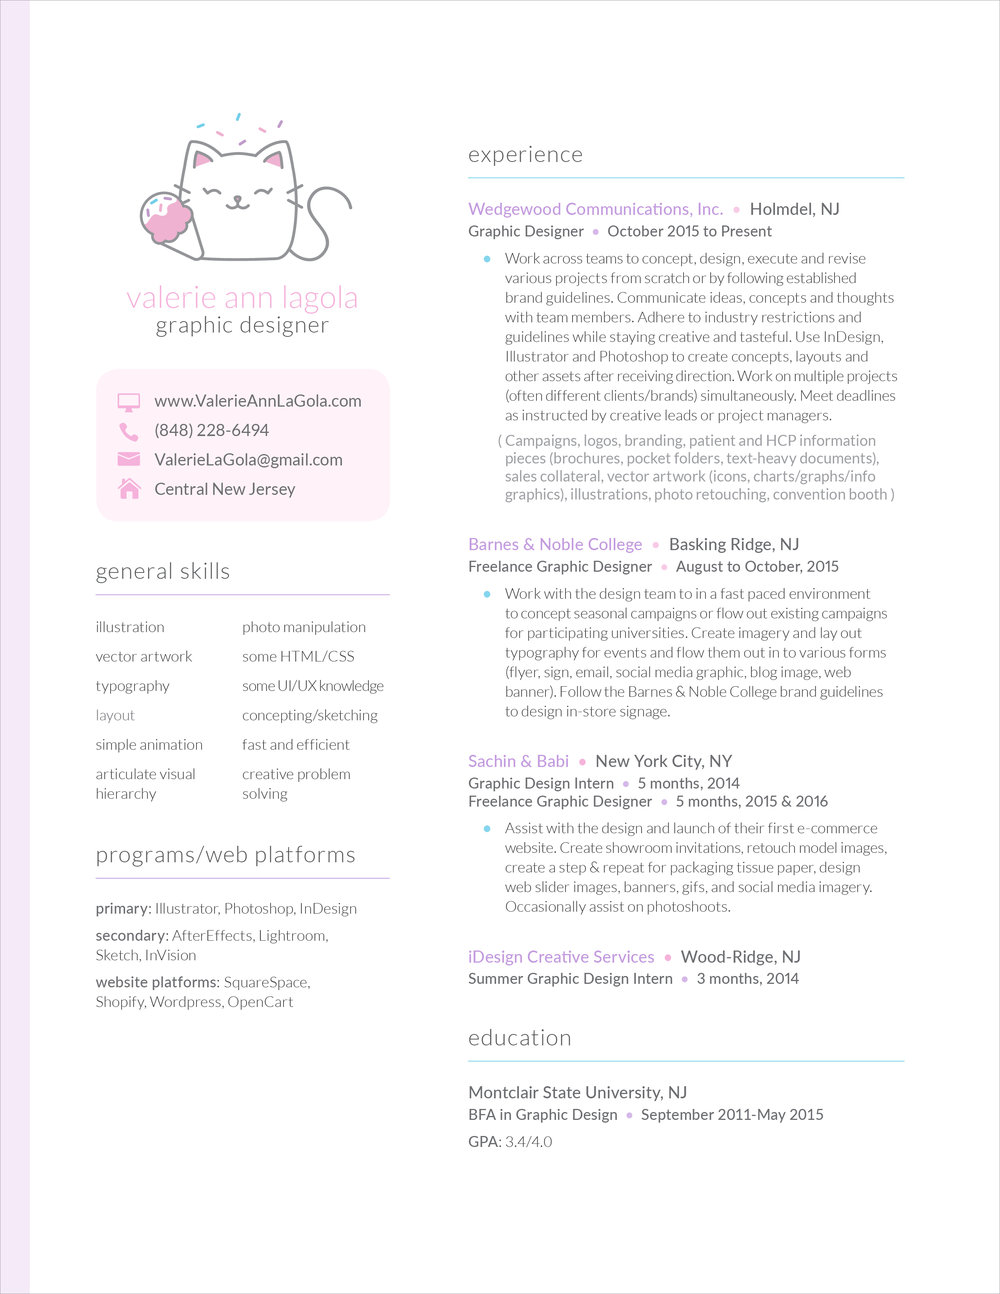 valerieannlagola_resume.jpg